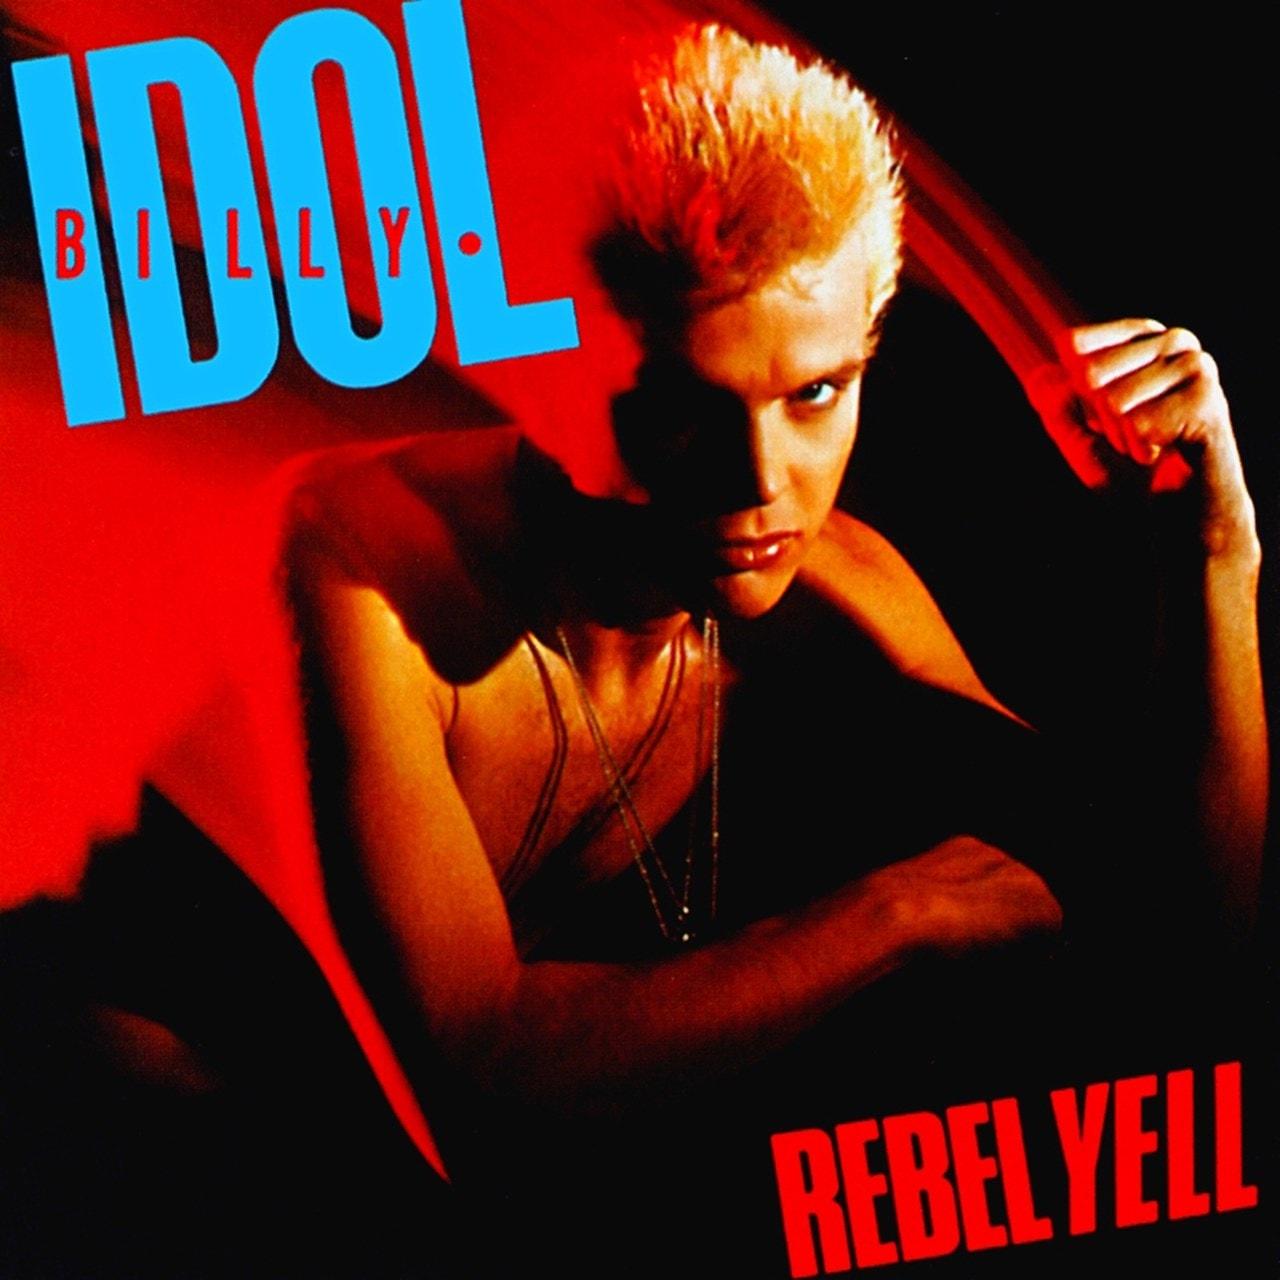 Rebel Yell - 1